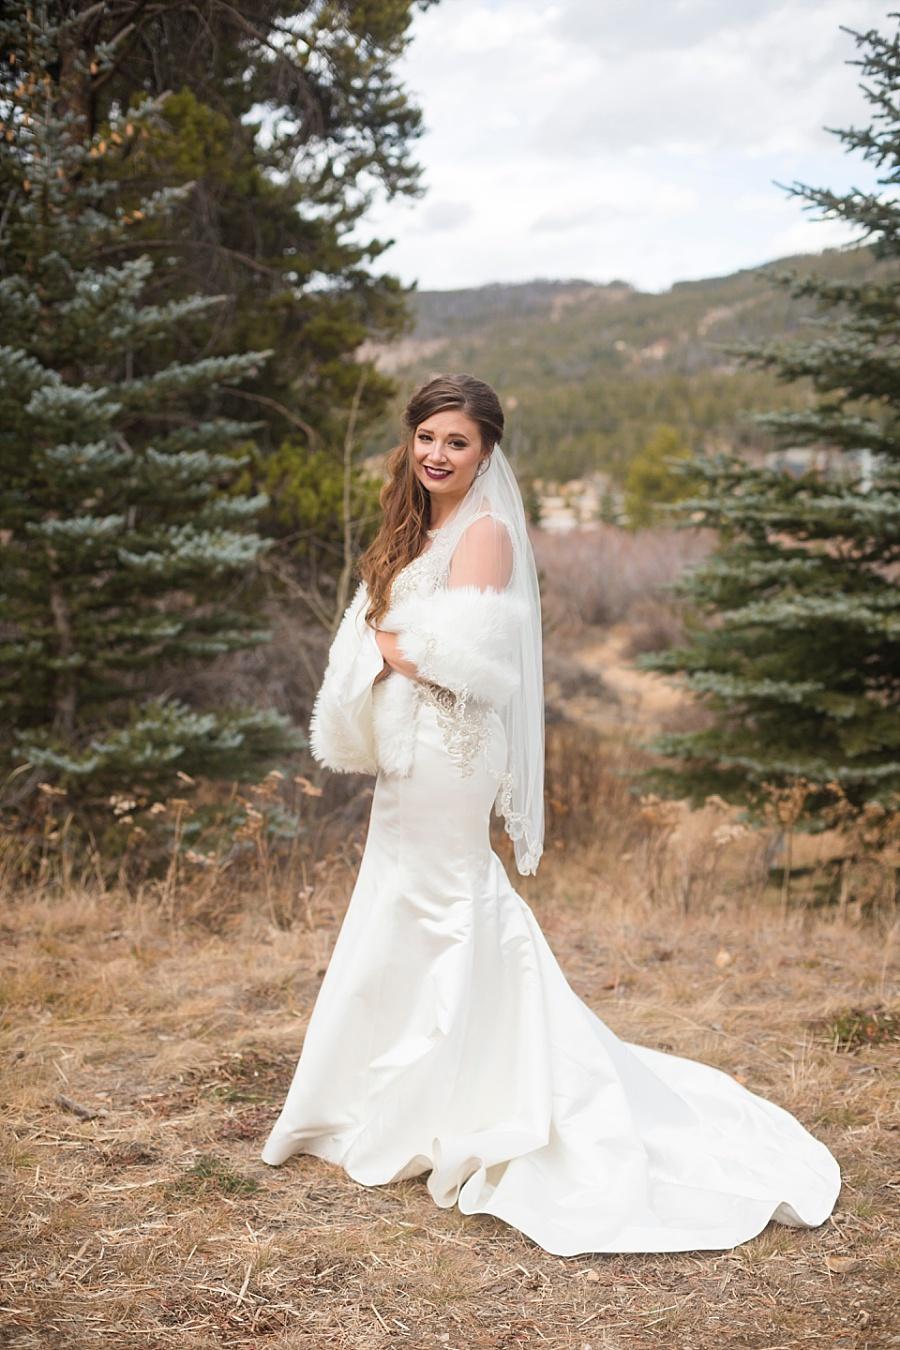 Stacy Anderson Photography Breckenridge Denver Boulder Vail Colorado Travel Lifestyle Elopement Vow renewal Family Wedding Photographer_0022.jpg